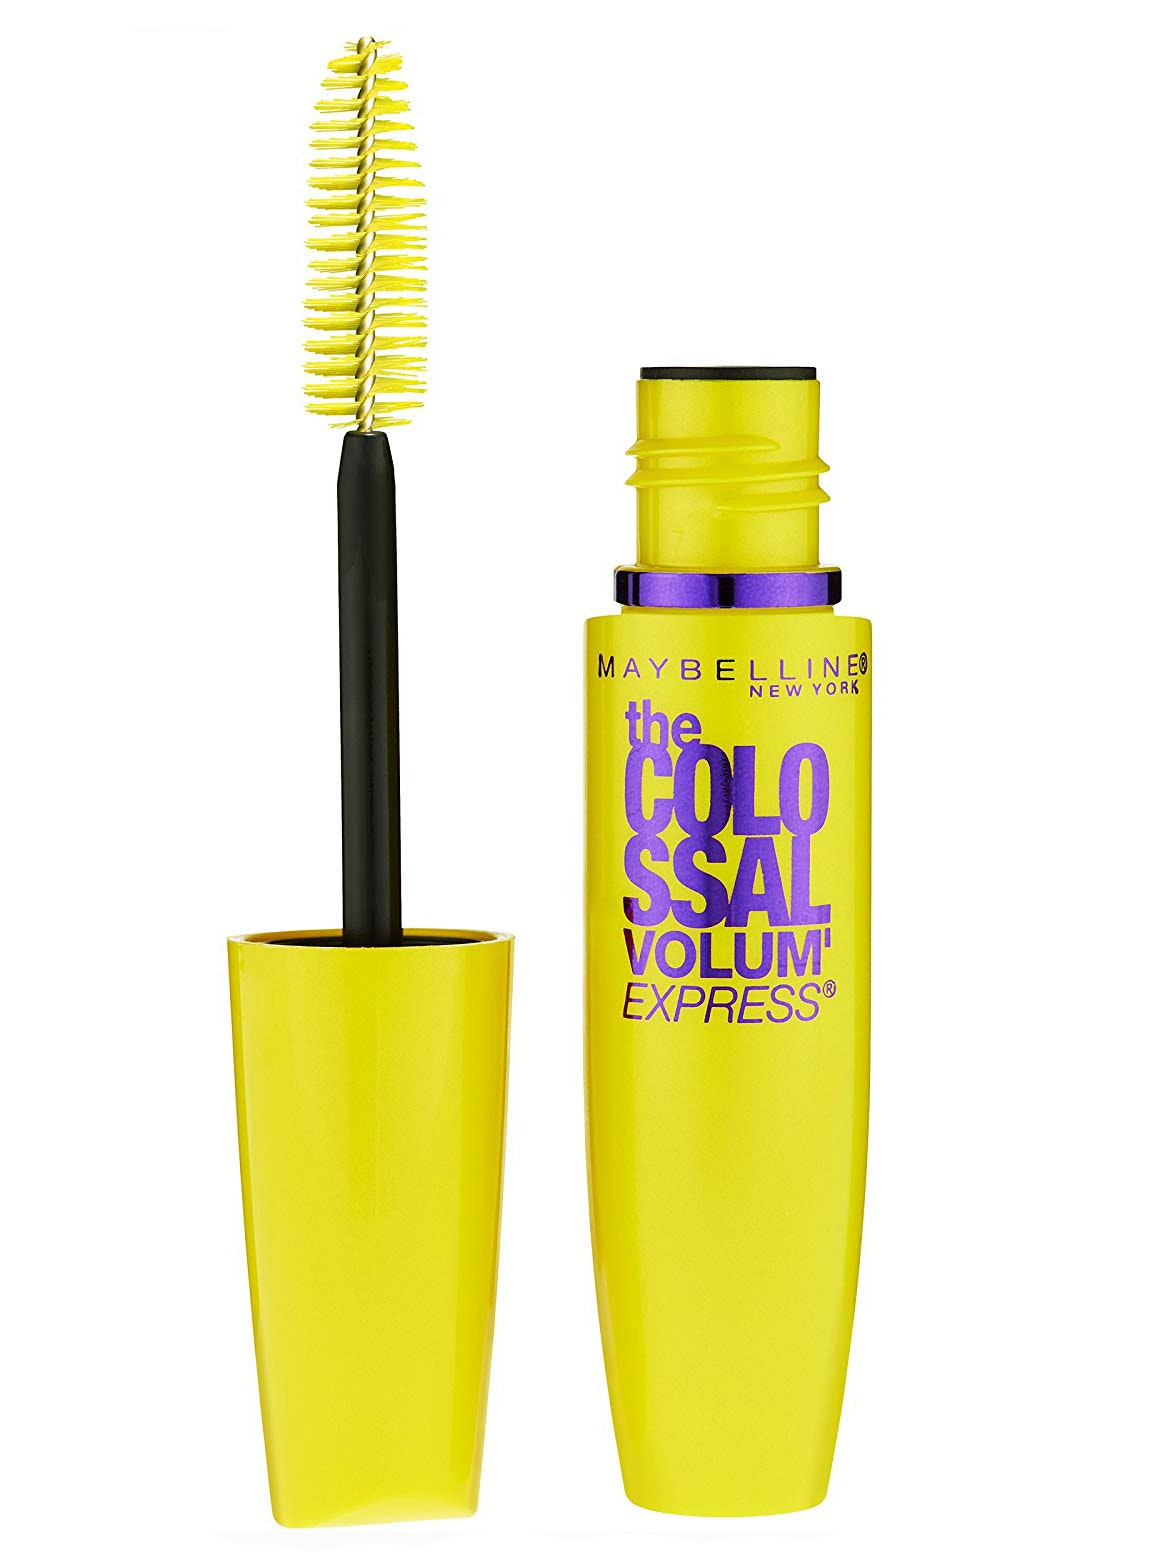 Colossal Volum' Express® Mascara